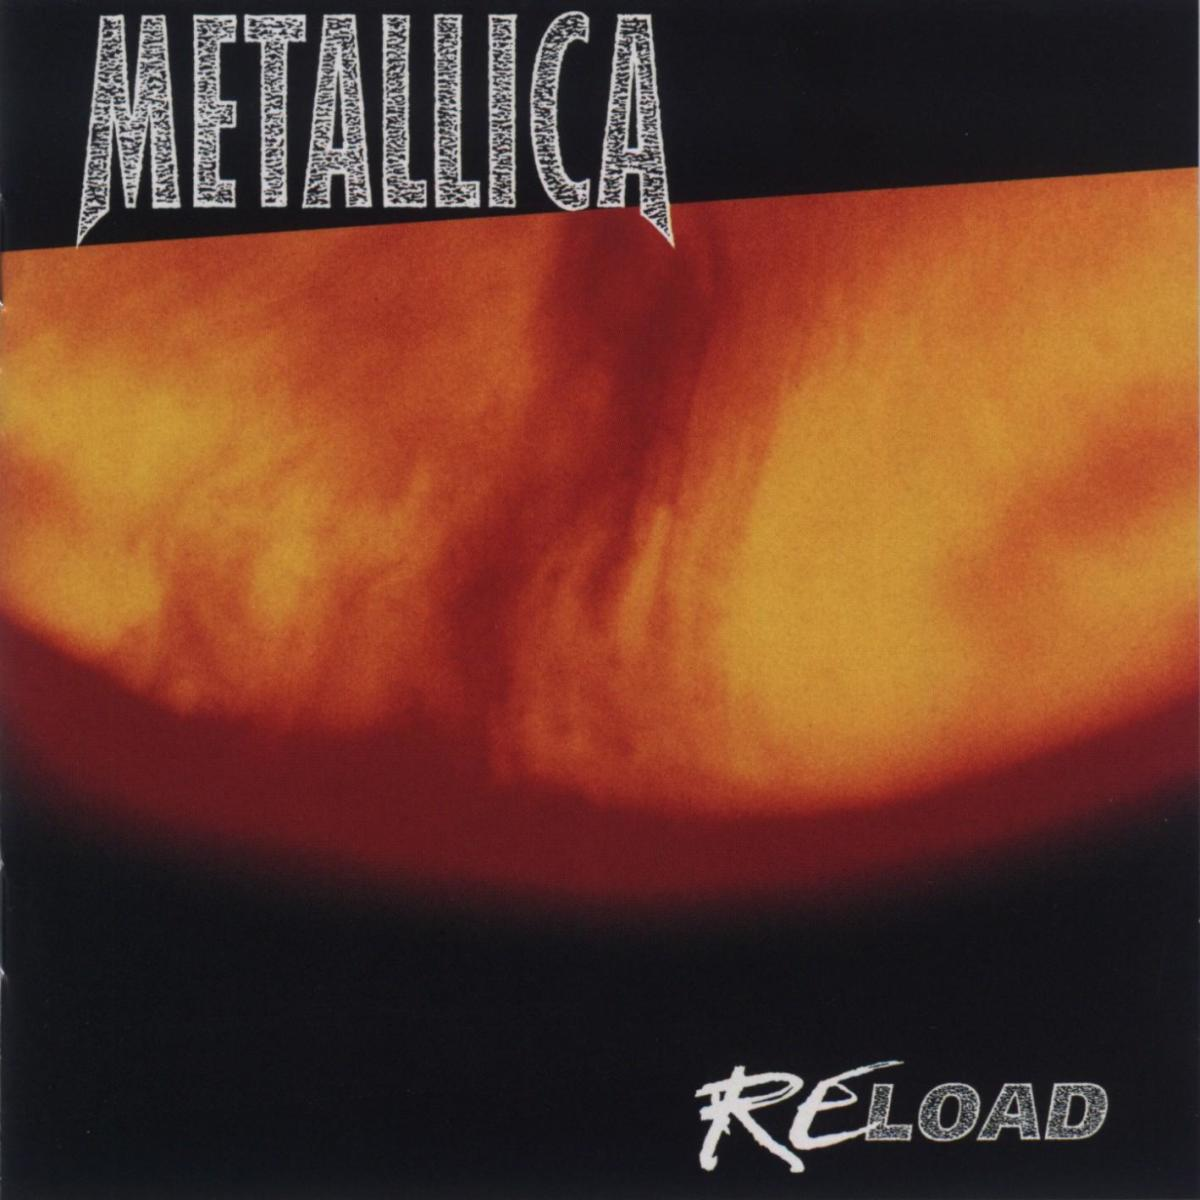 A Review of a Forgotten album: Metallica Re-Load